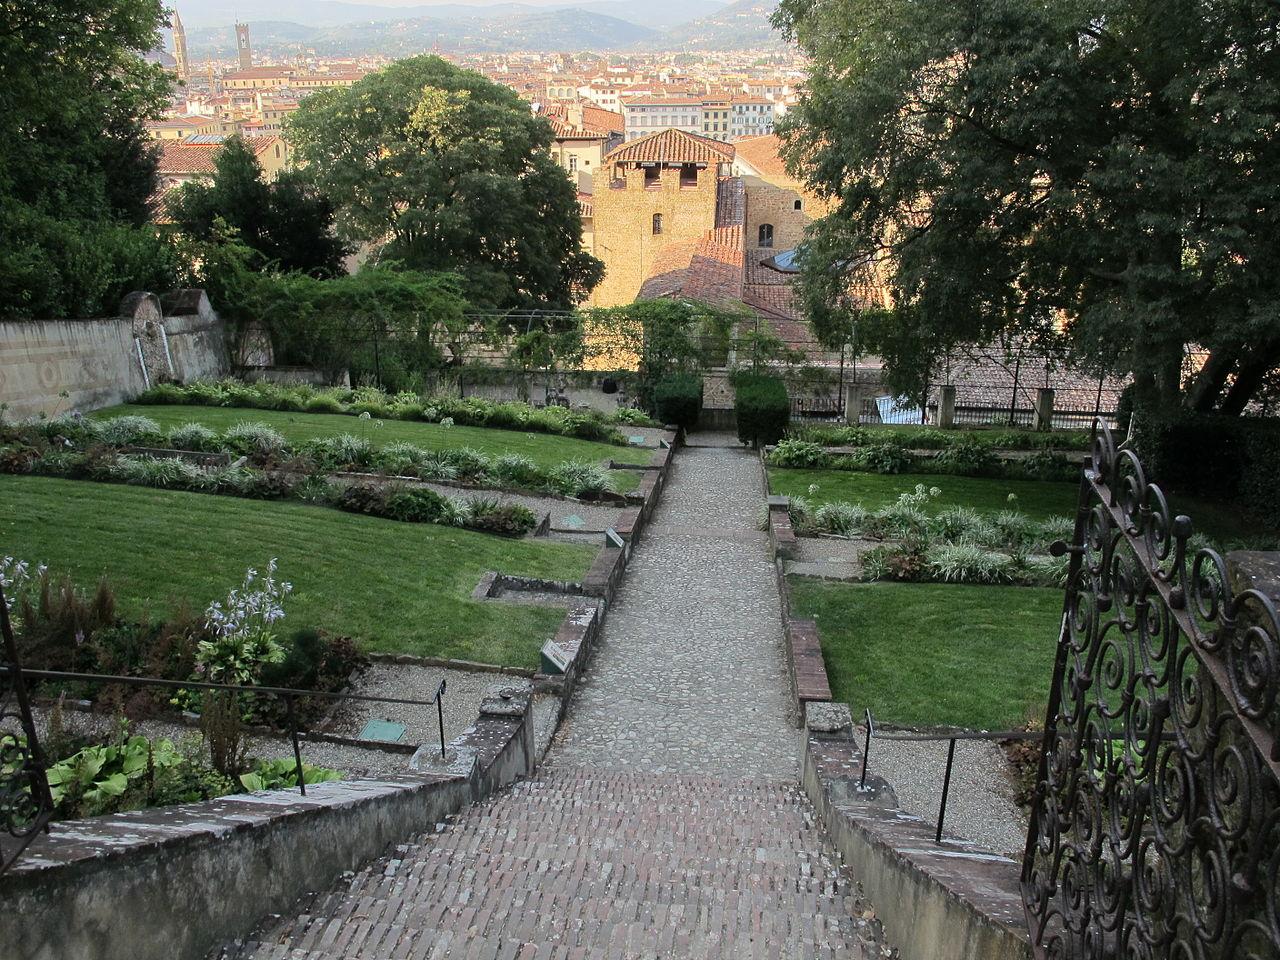 Firenze, Giardino Bardini, giardino a terrazze e Palazzo Mozzi